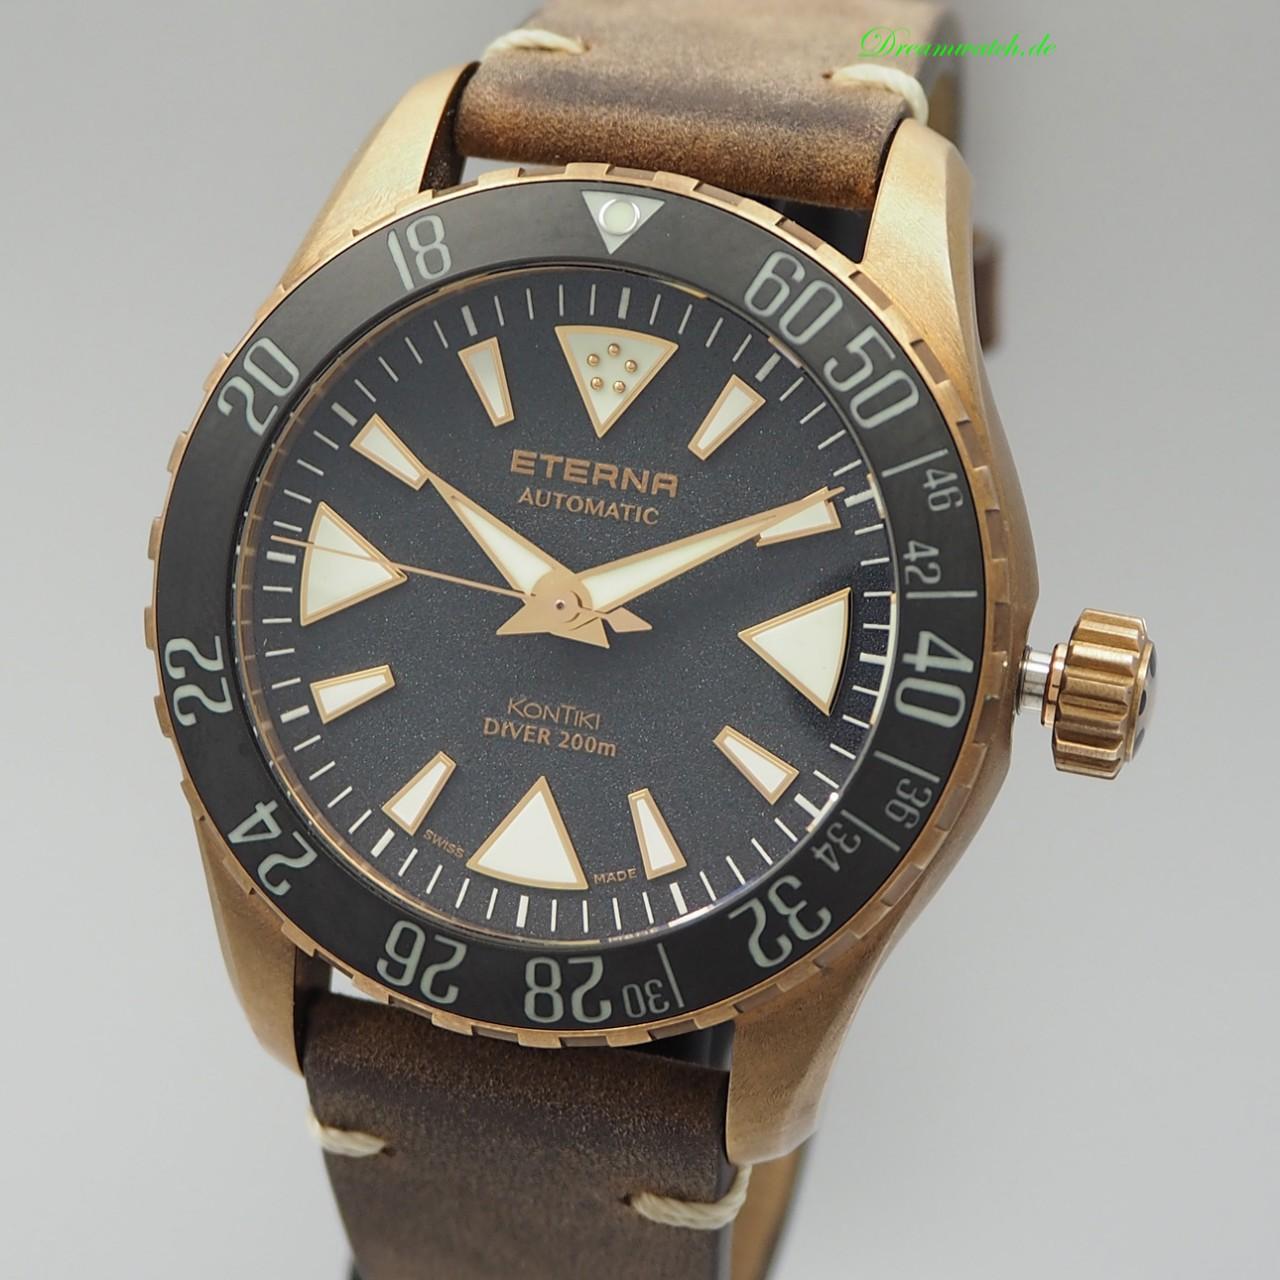 Eterna Kontiki DIVER Bronze Manufacture Limited Editon 300 / 1291.78.49 , Box+Papiere wie neu